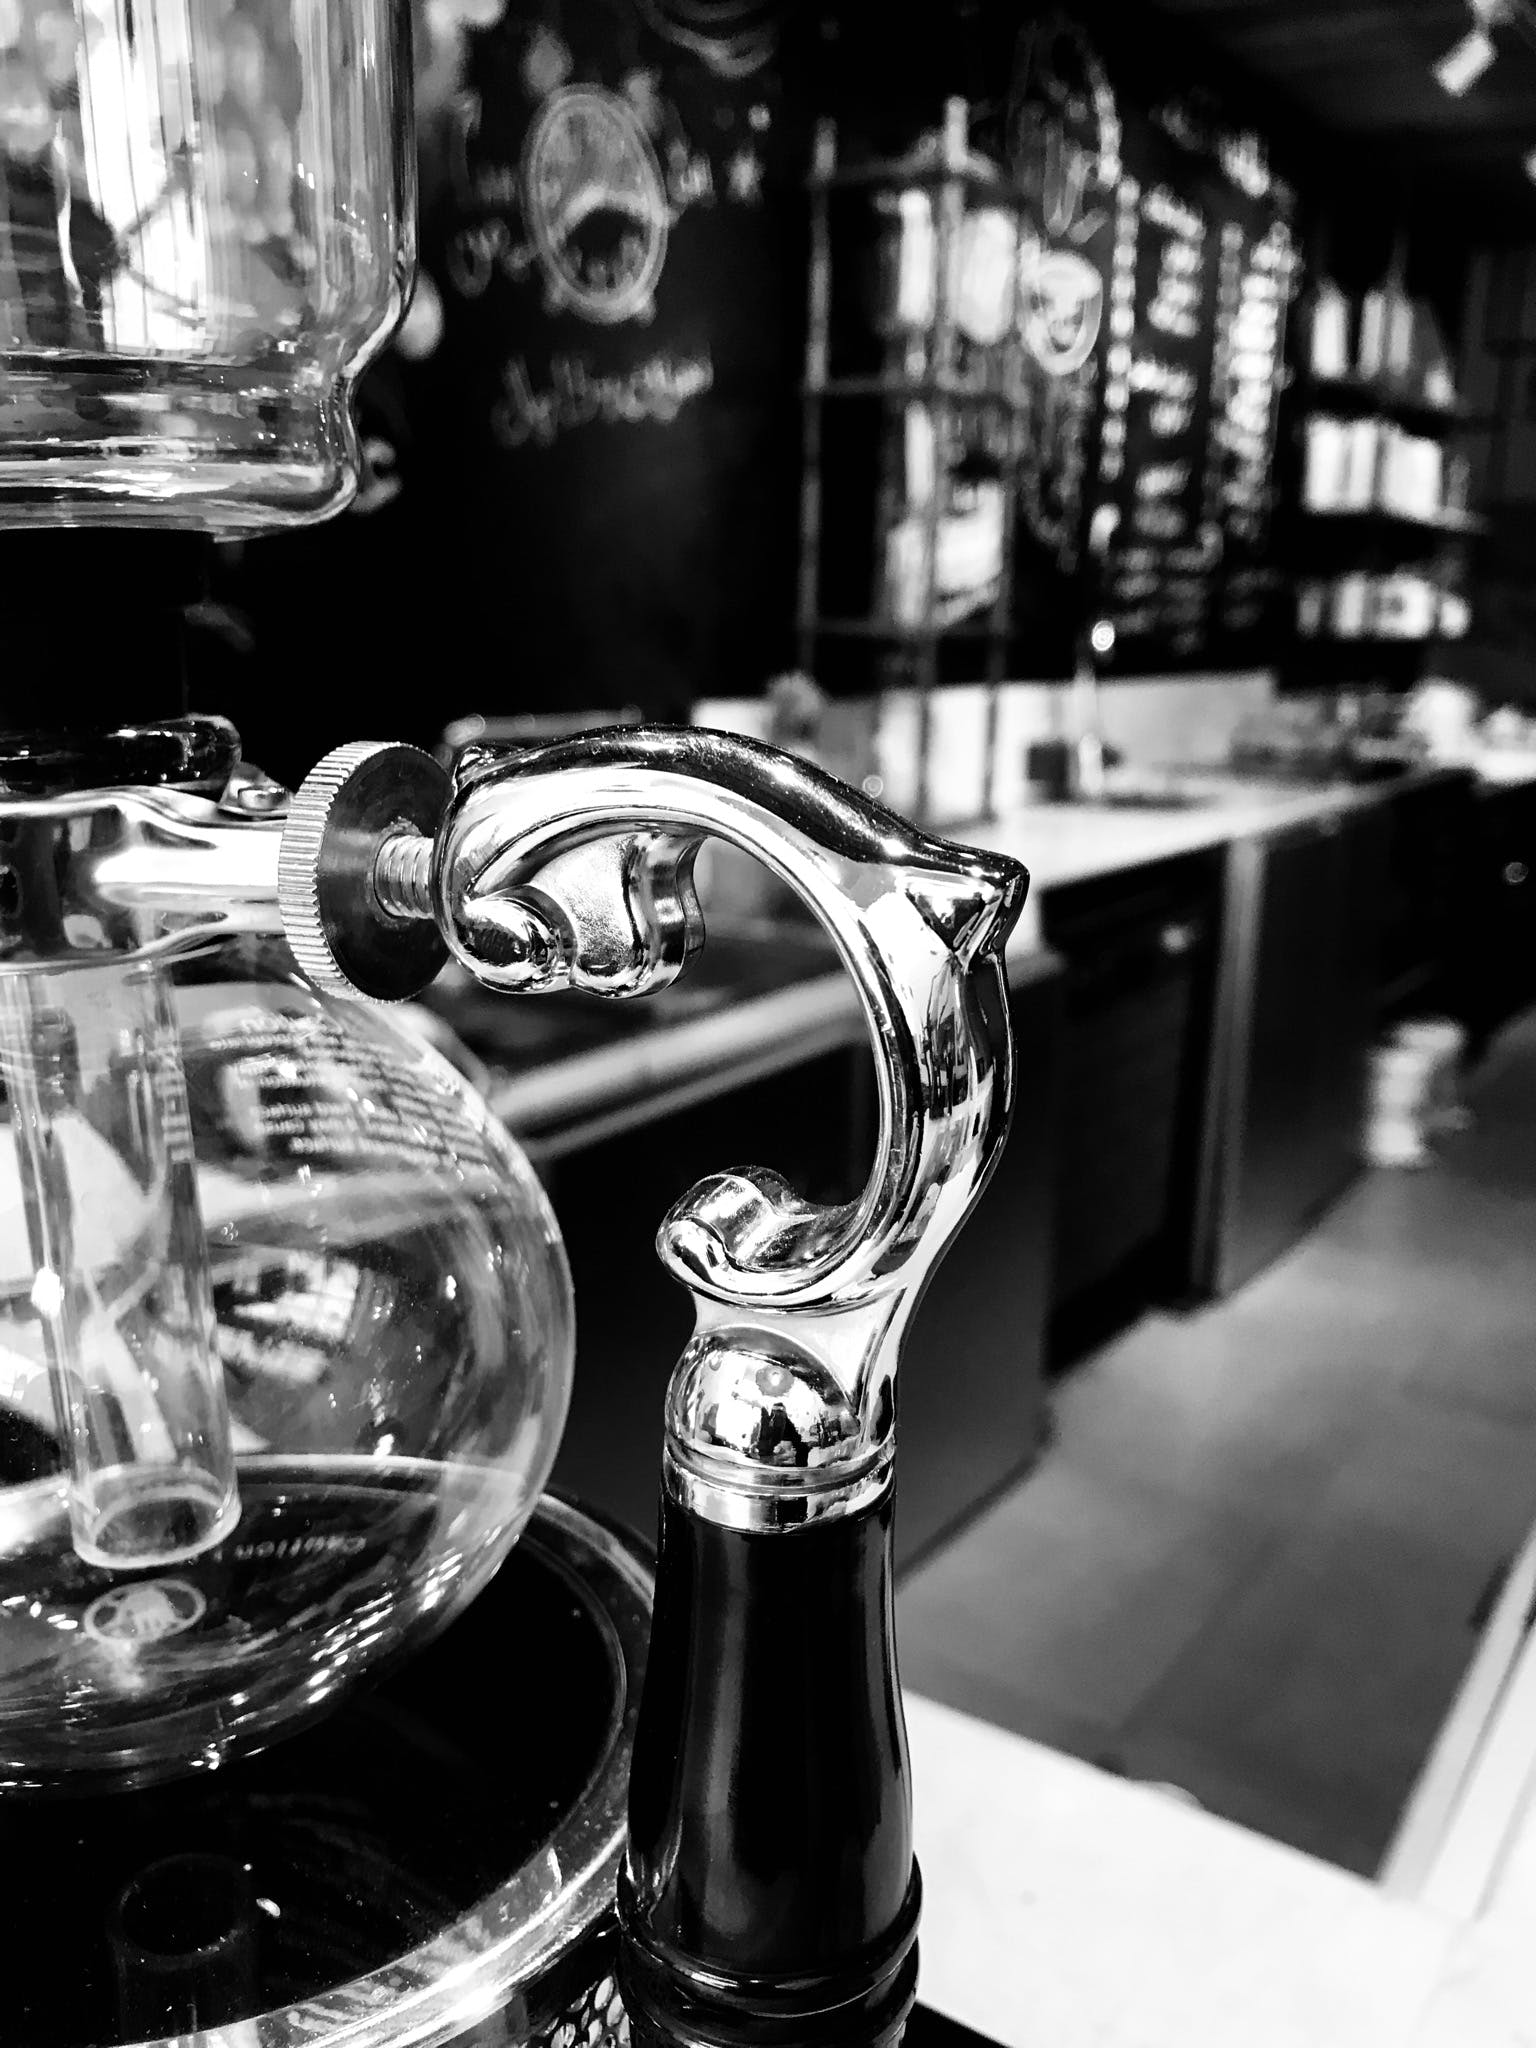 Free stock photo of Cafe Riyadh machine